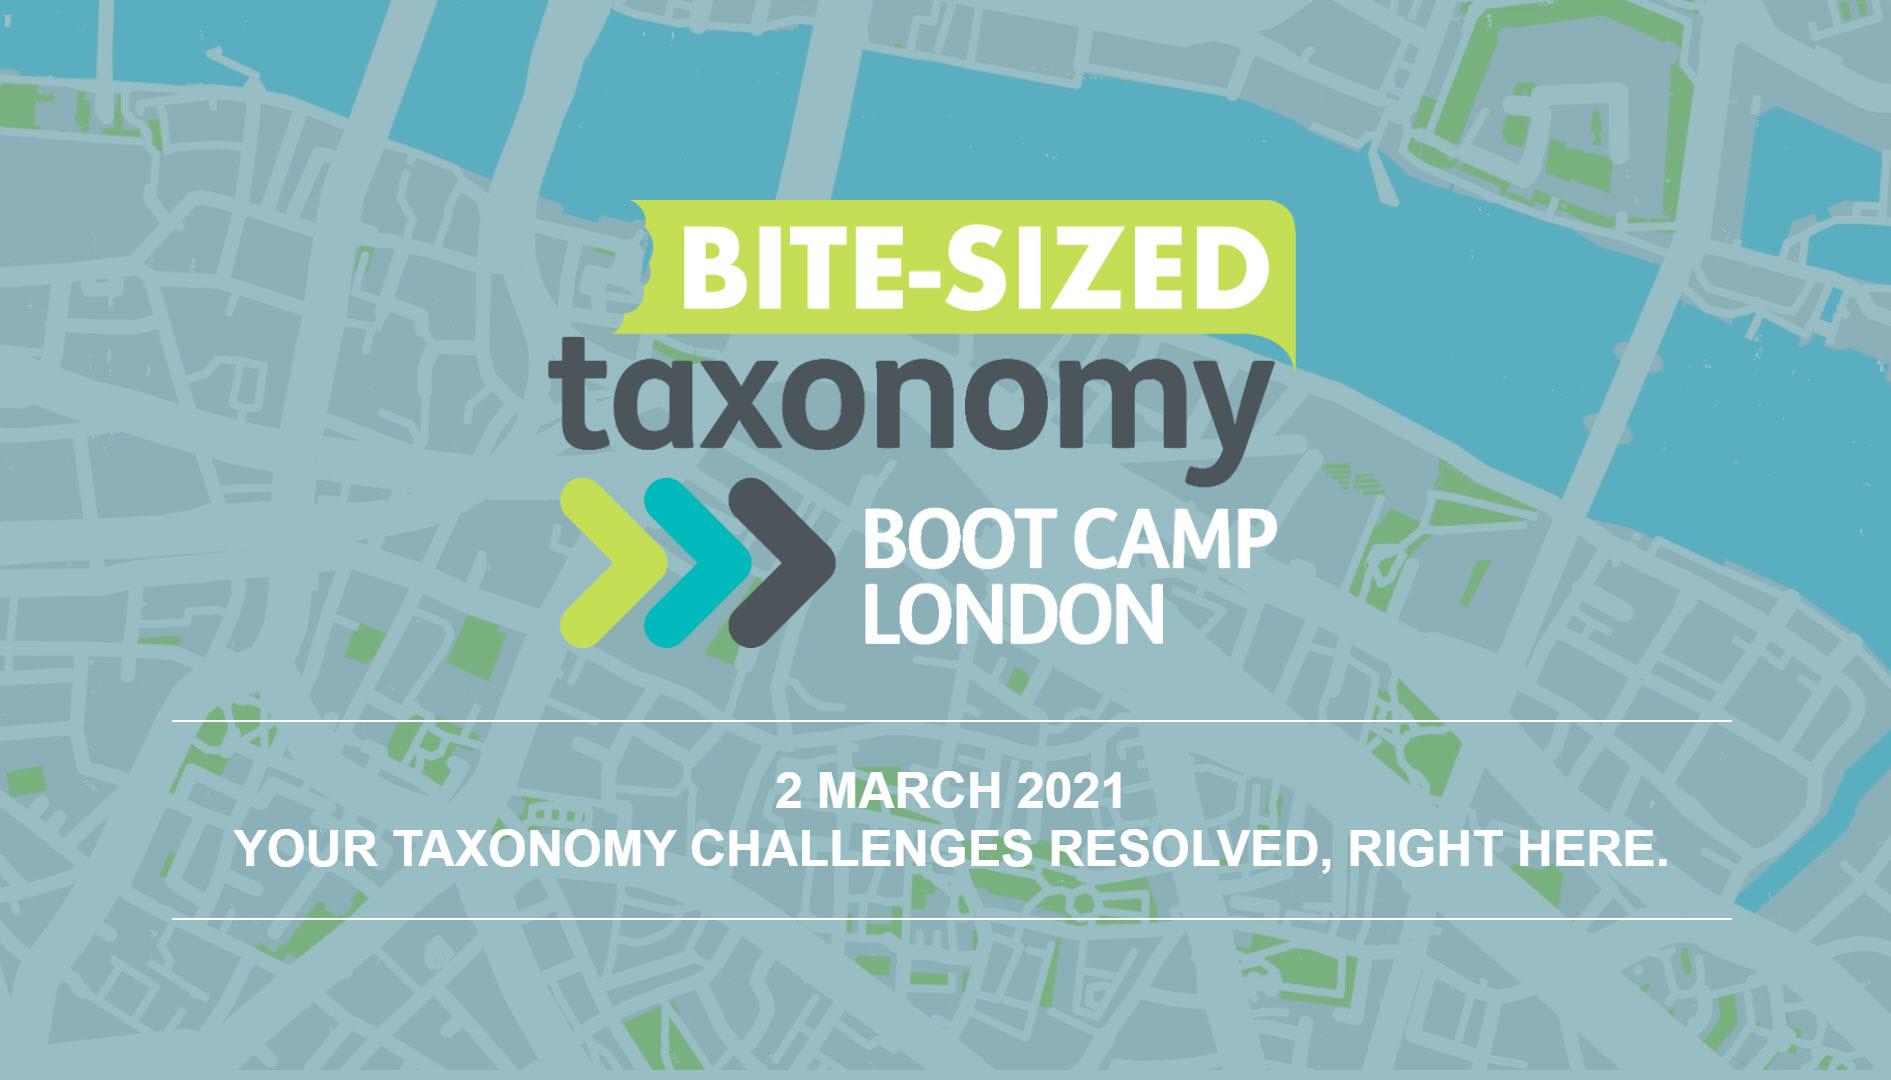 Bite-Sized Taxonomy Bootcamp London